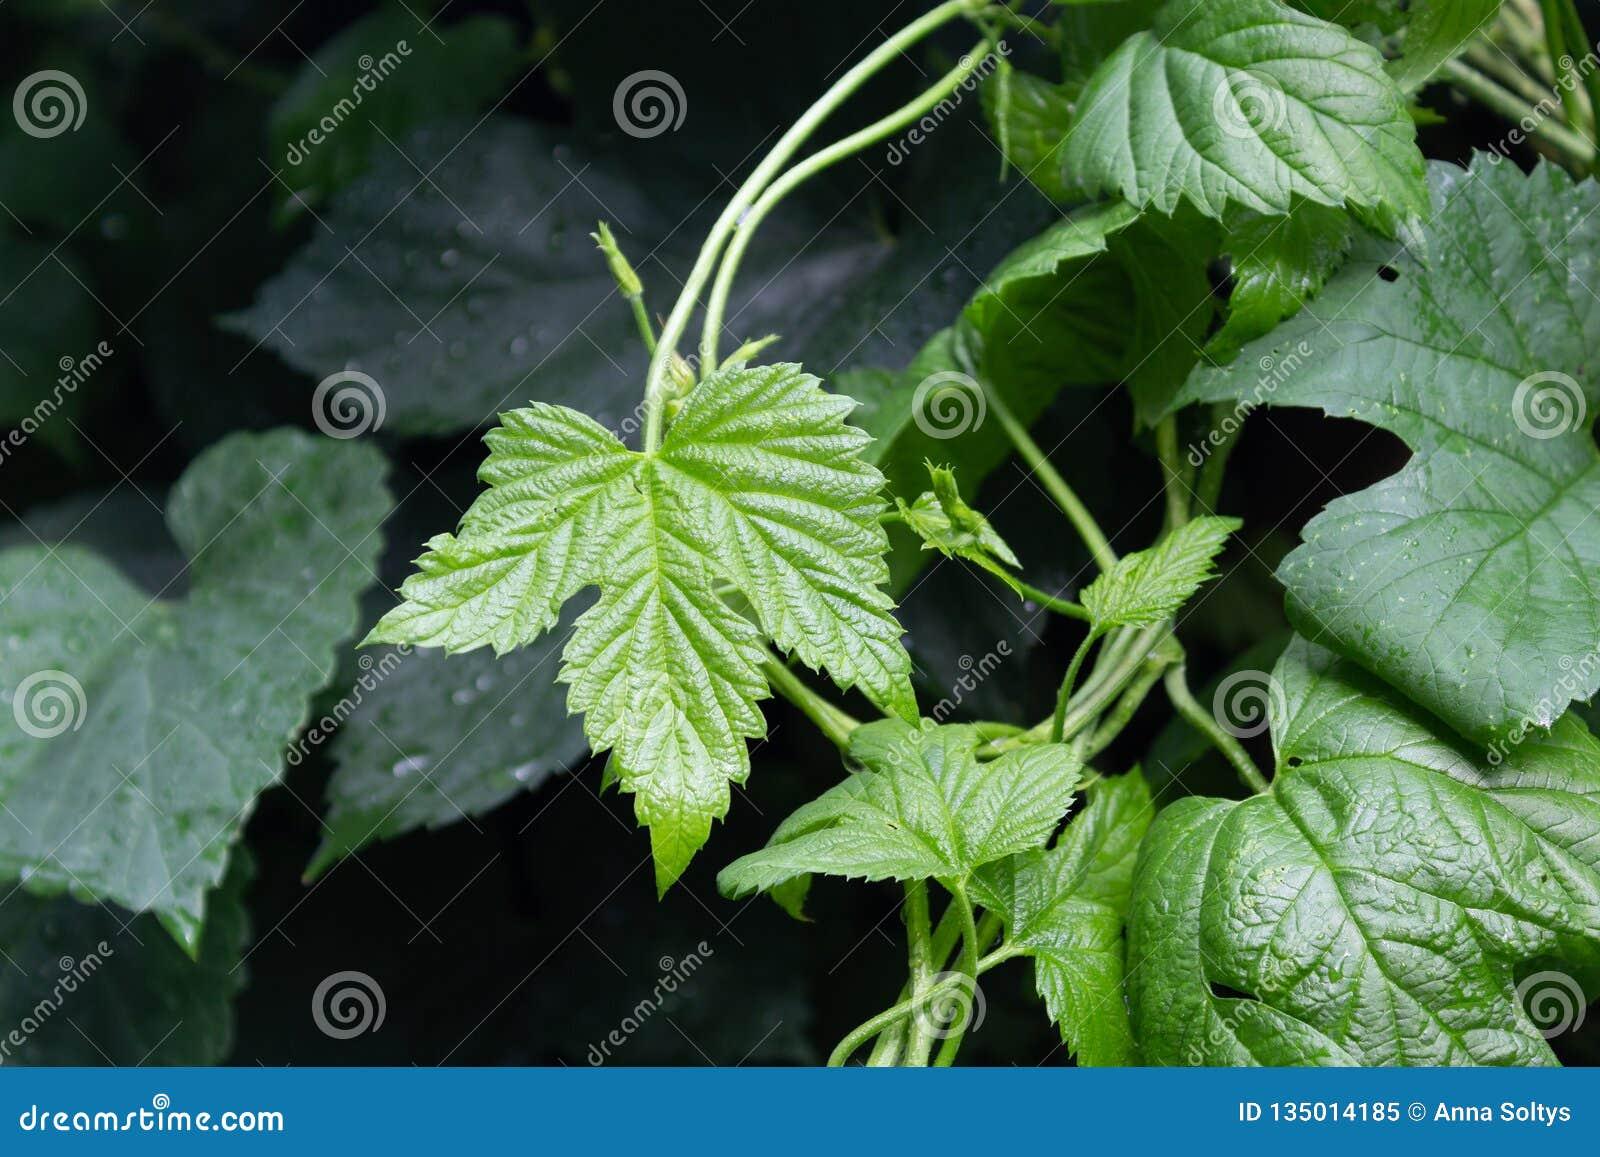 Butterfly in green foliage